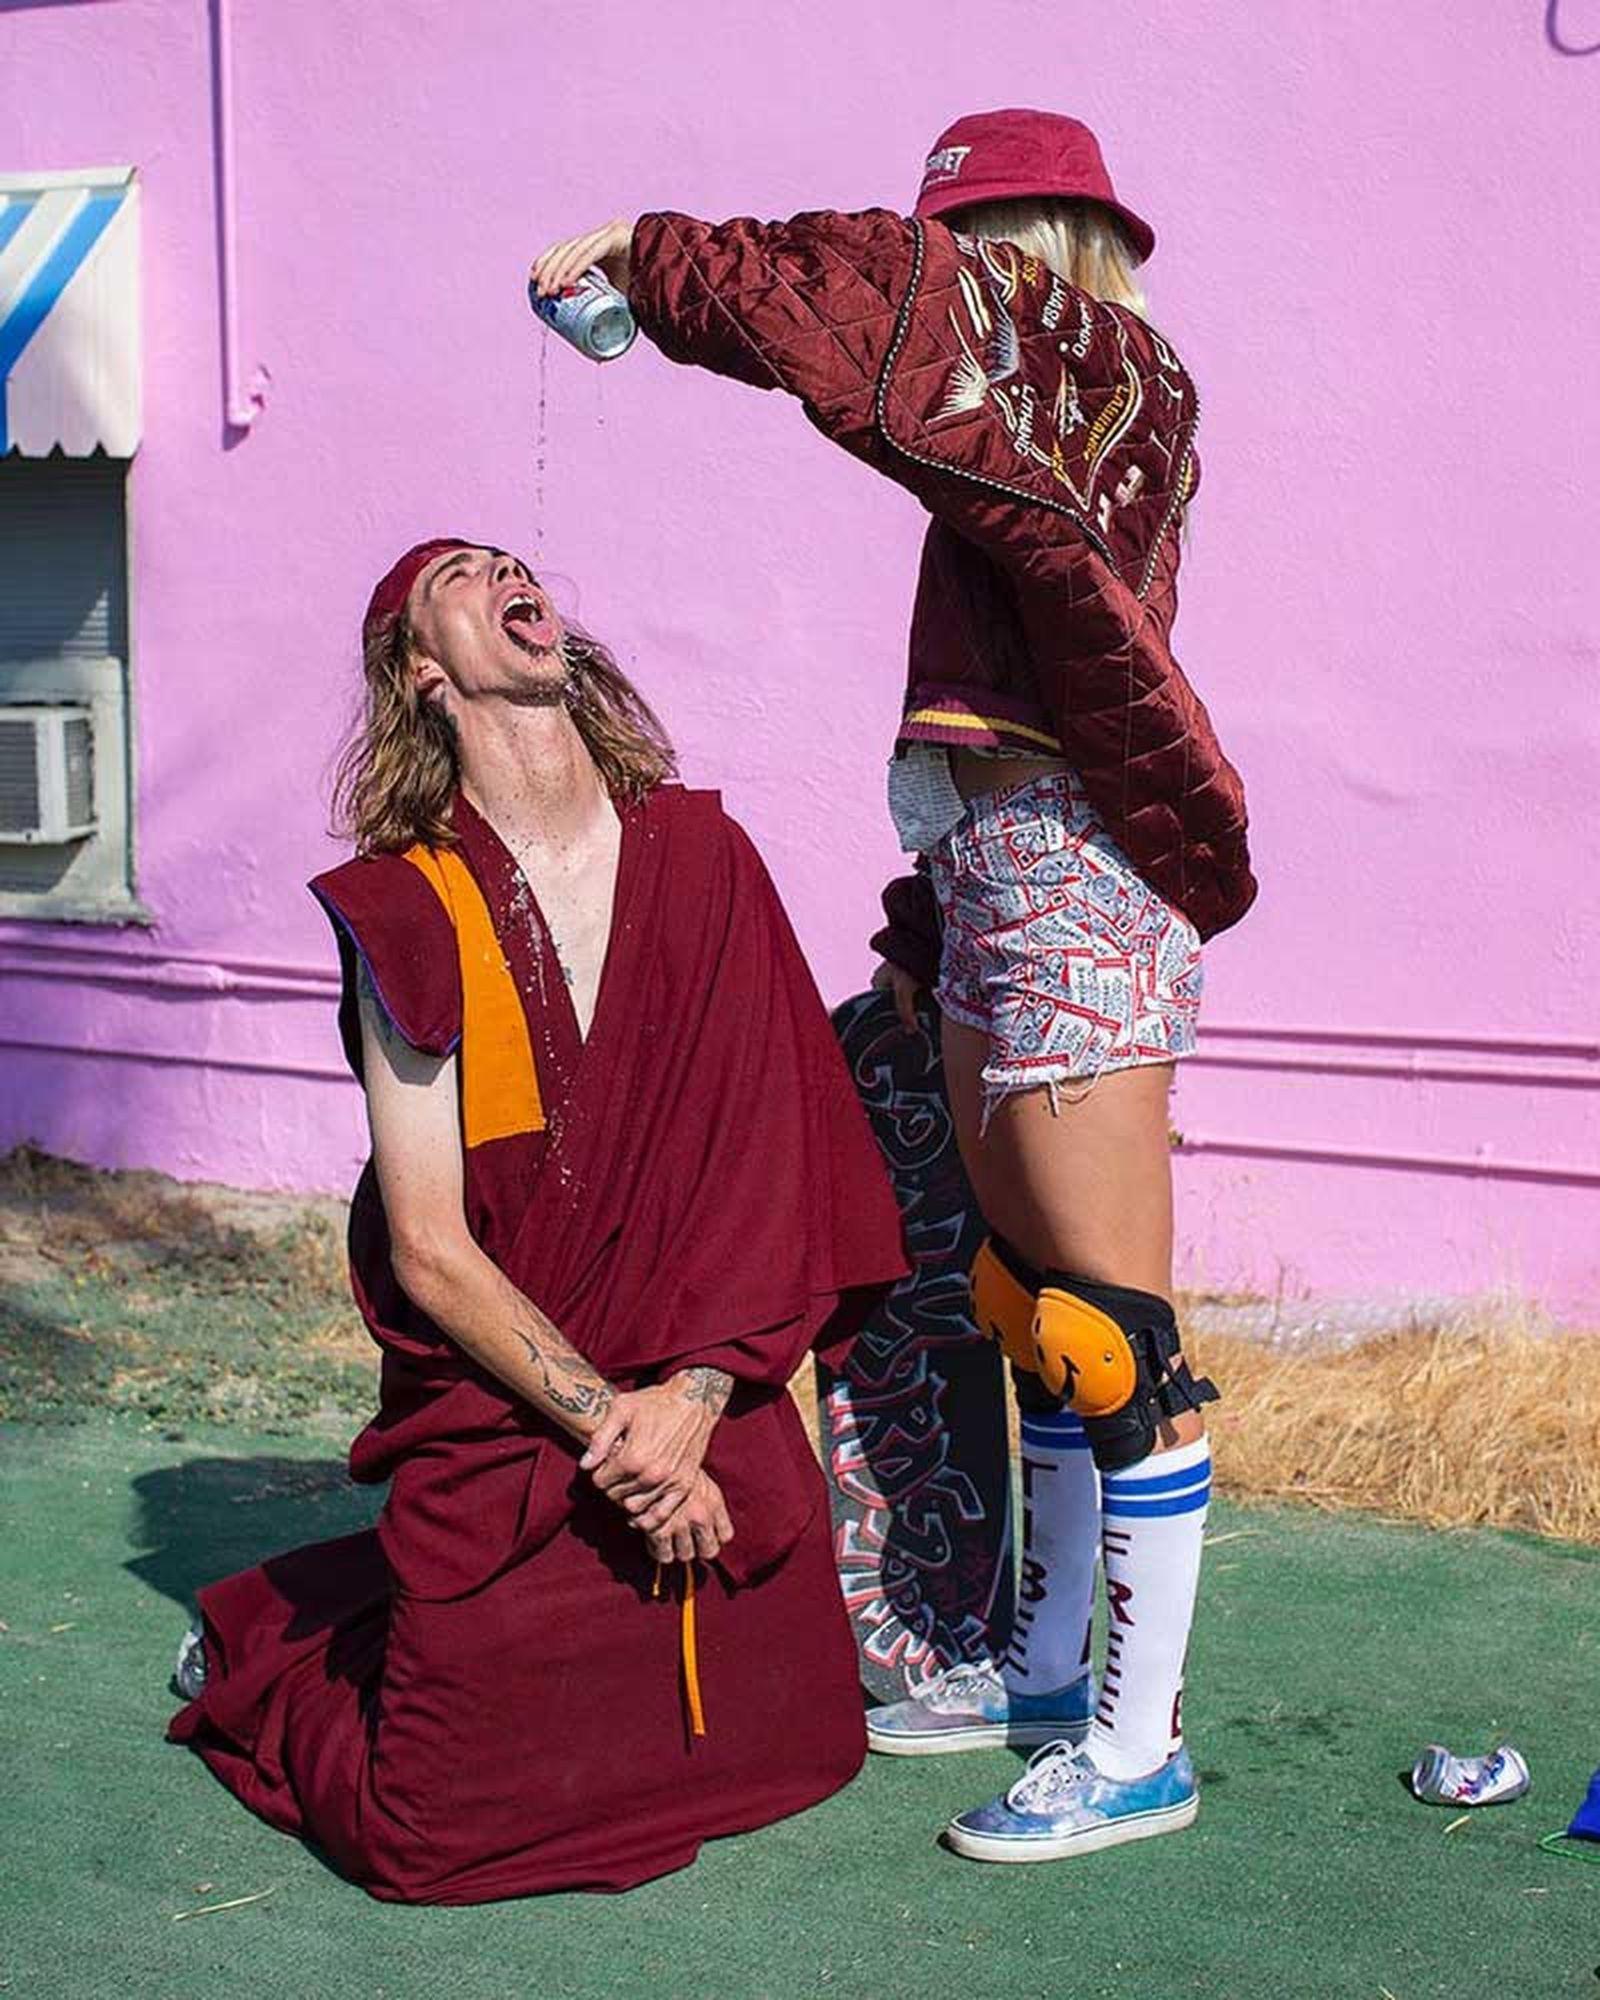 kapital-kountry-free-tibet-collection-controversy-(38)